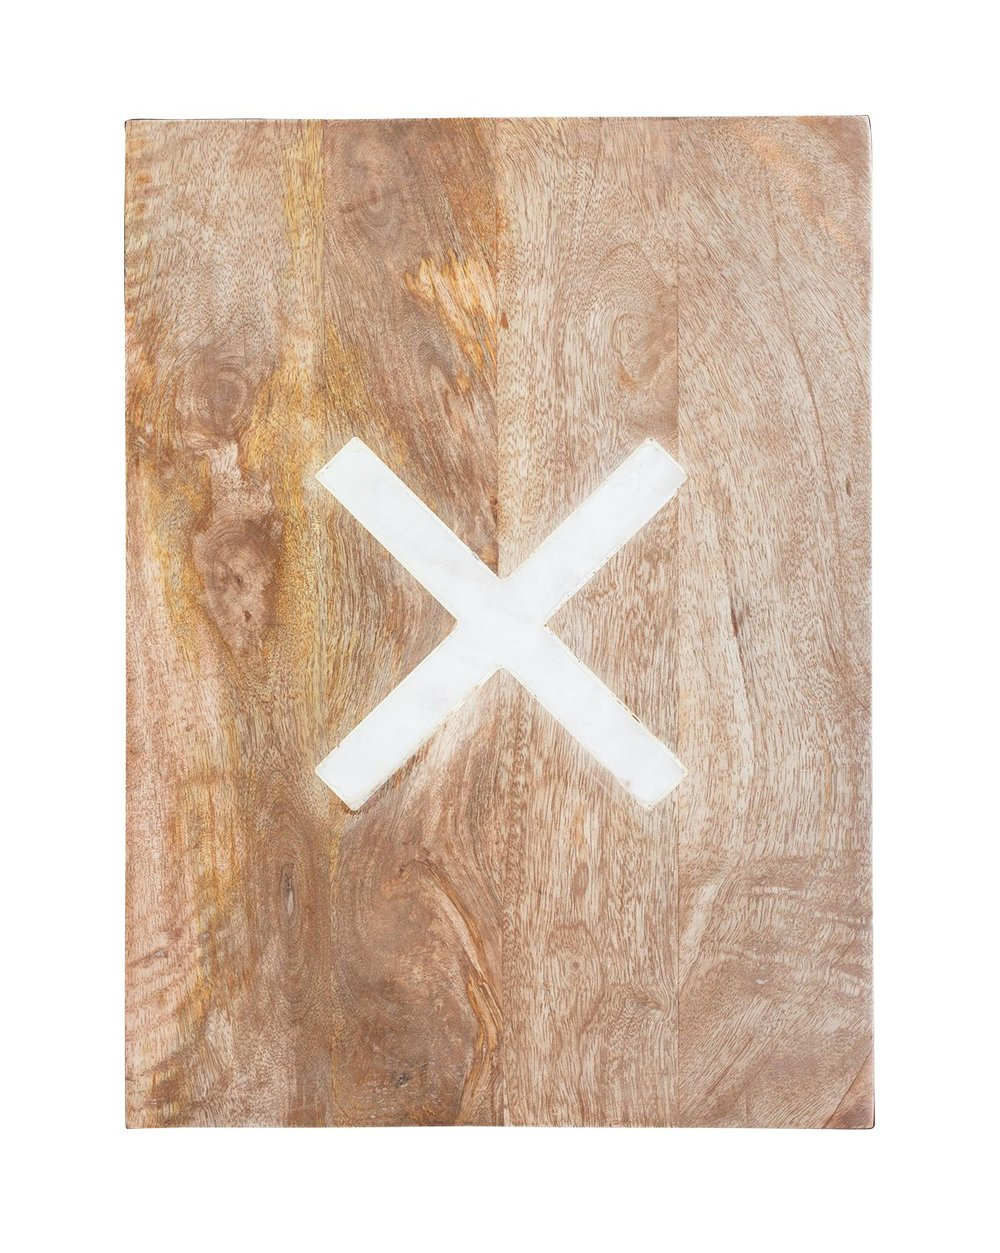 Marble_X_Cutting_Board_1.jpg